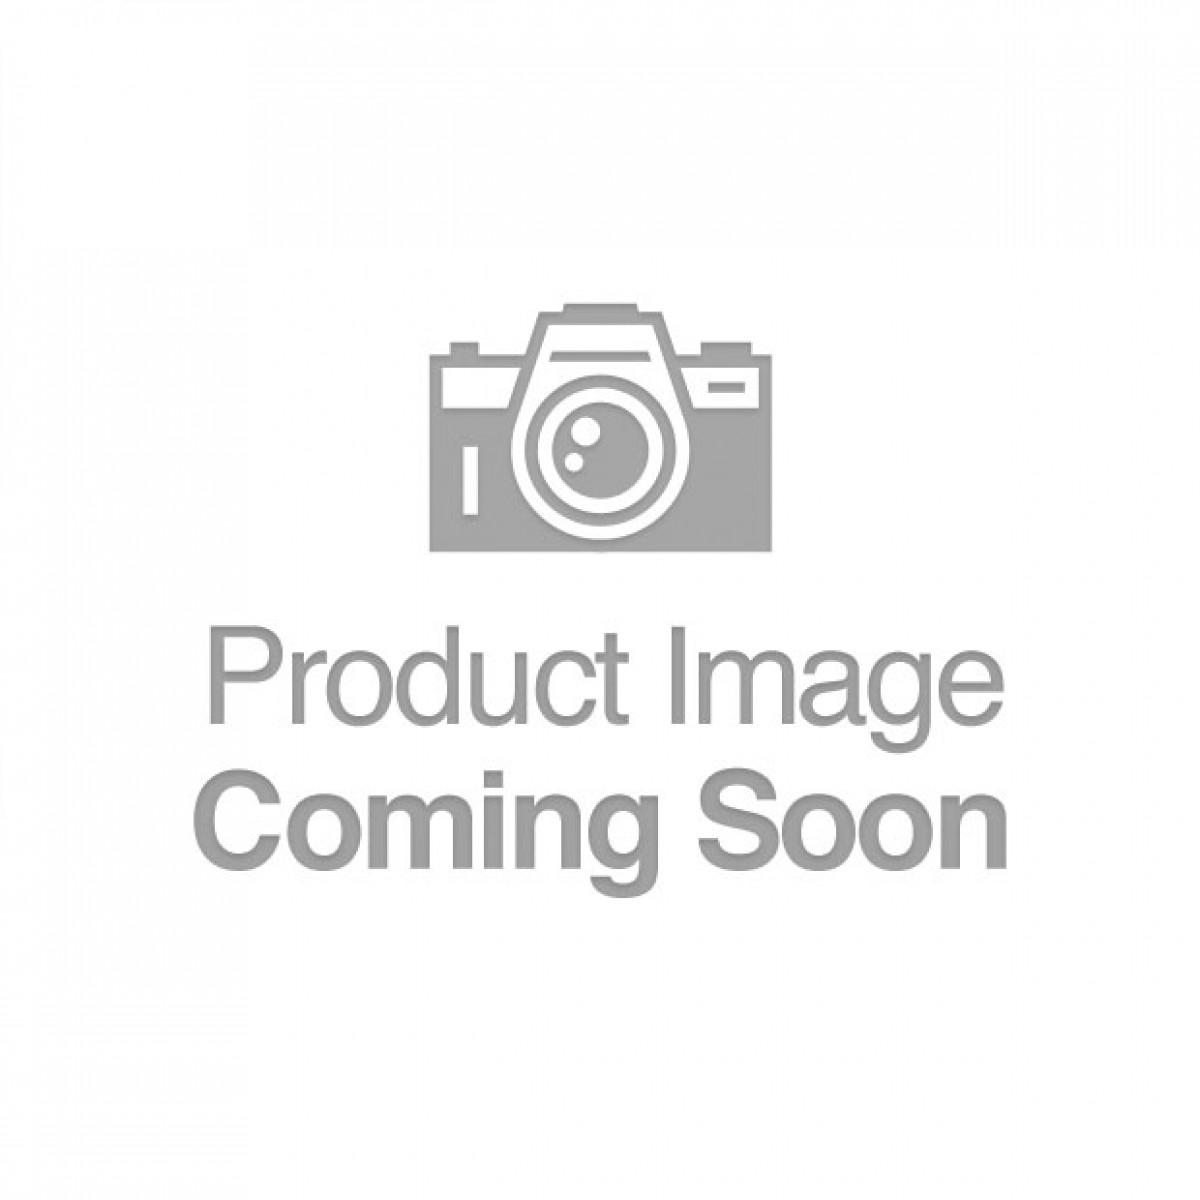 Alpha Pro 7x P-Stroke Prostate Stimulator w/Stroking Shaft - Black